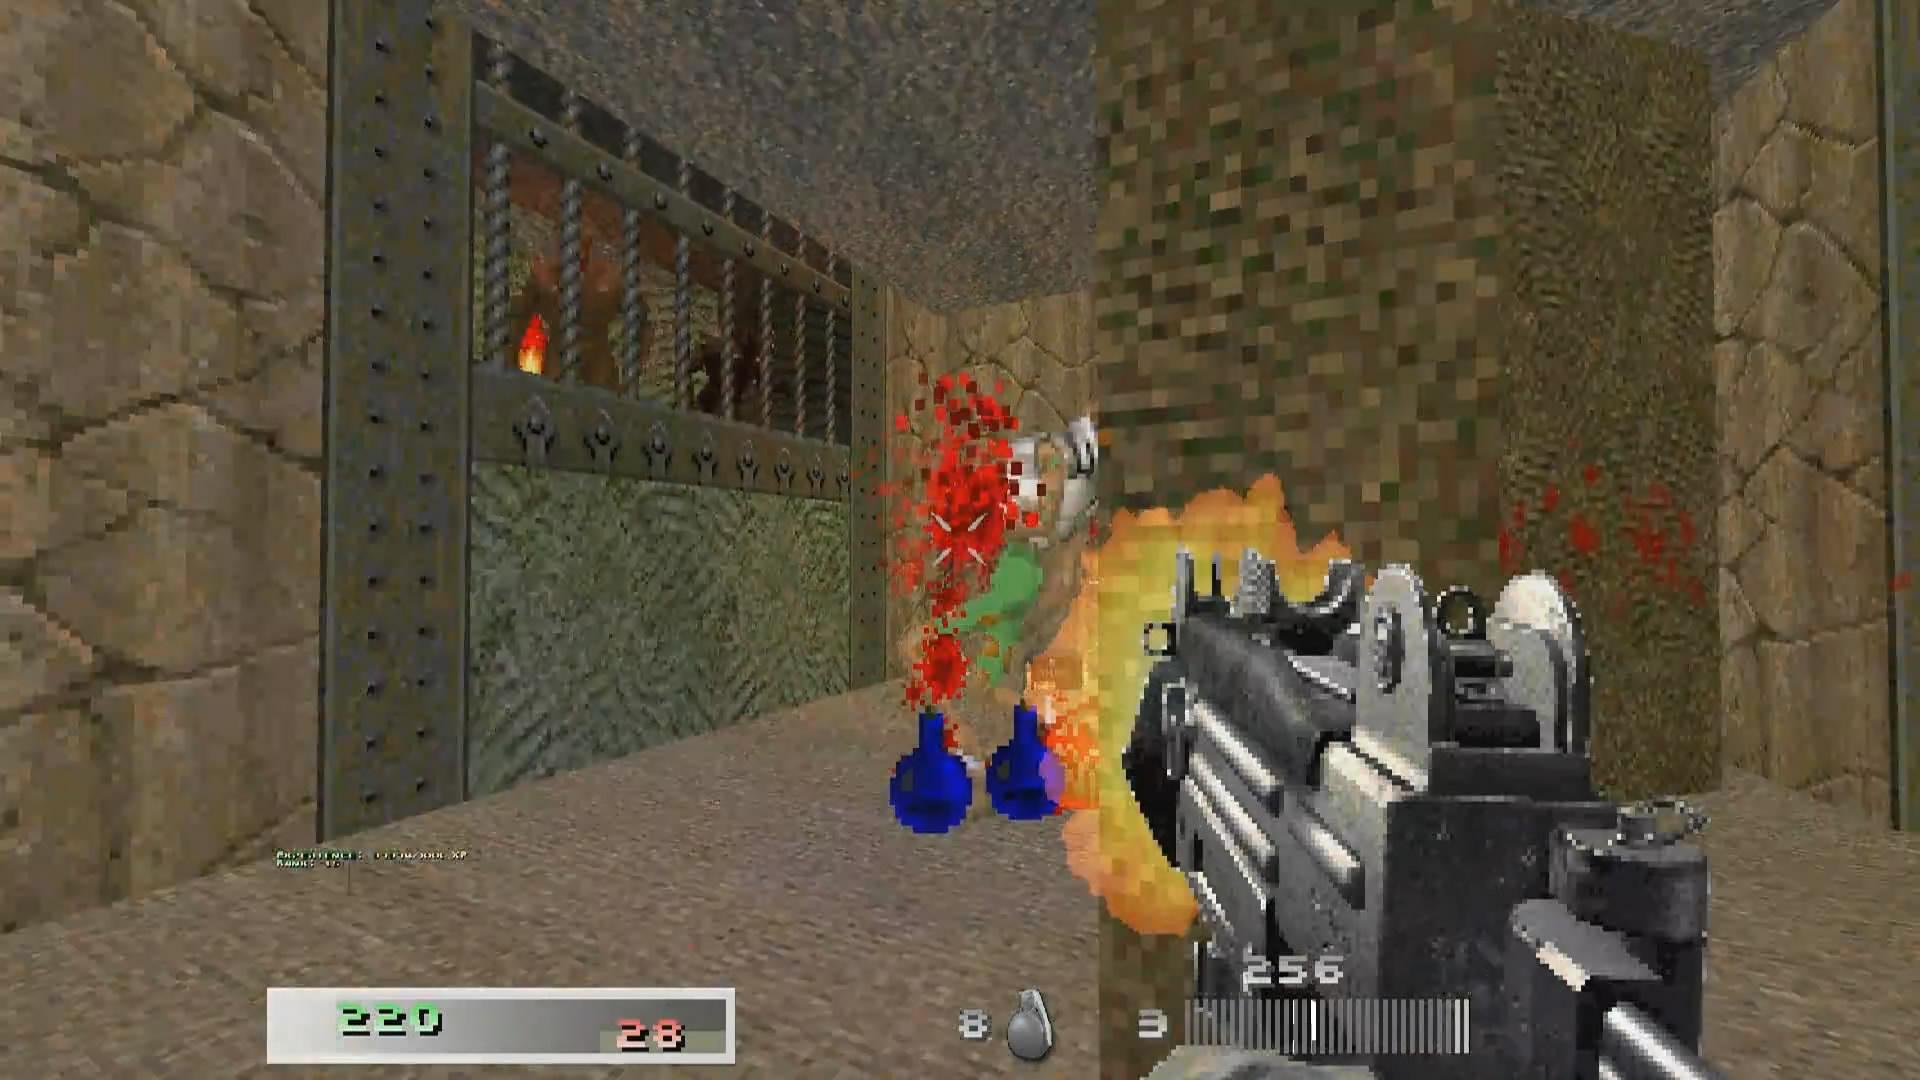 RGA 2 file - Realguns Hardcore mod for Doom - Mod DB